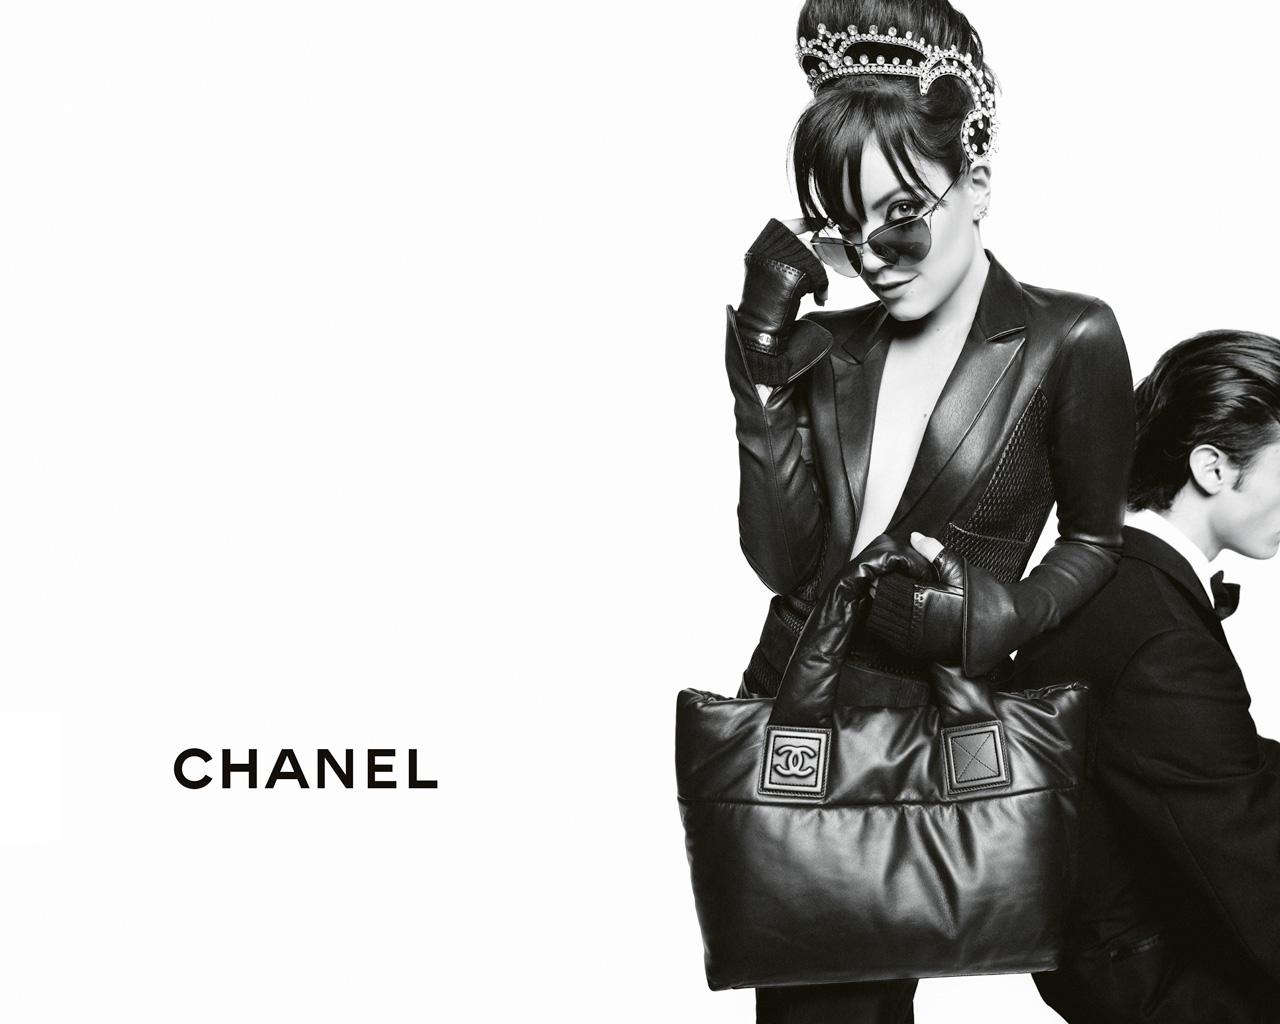 Coco Chanel Wallpaper HD WallpaperMinecom 1280x1024